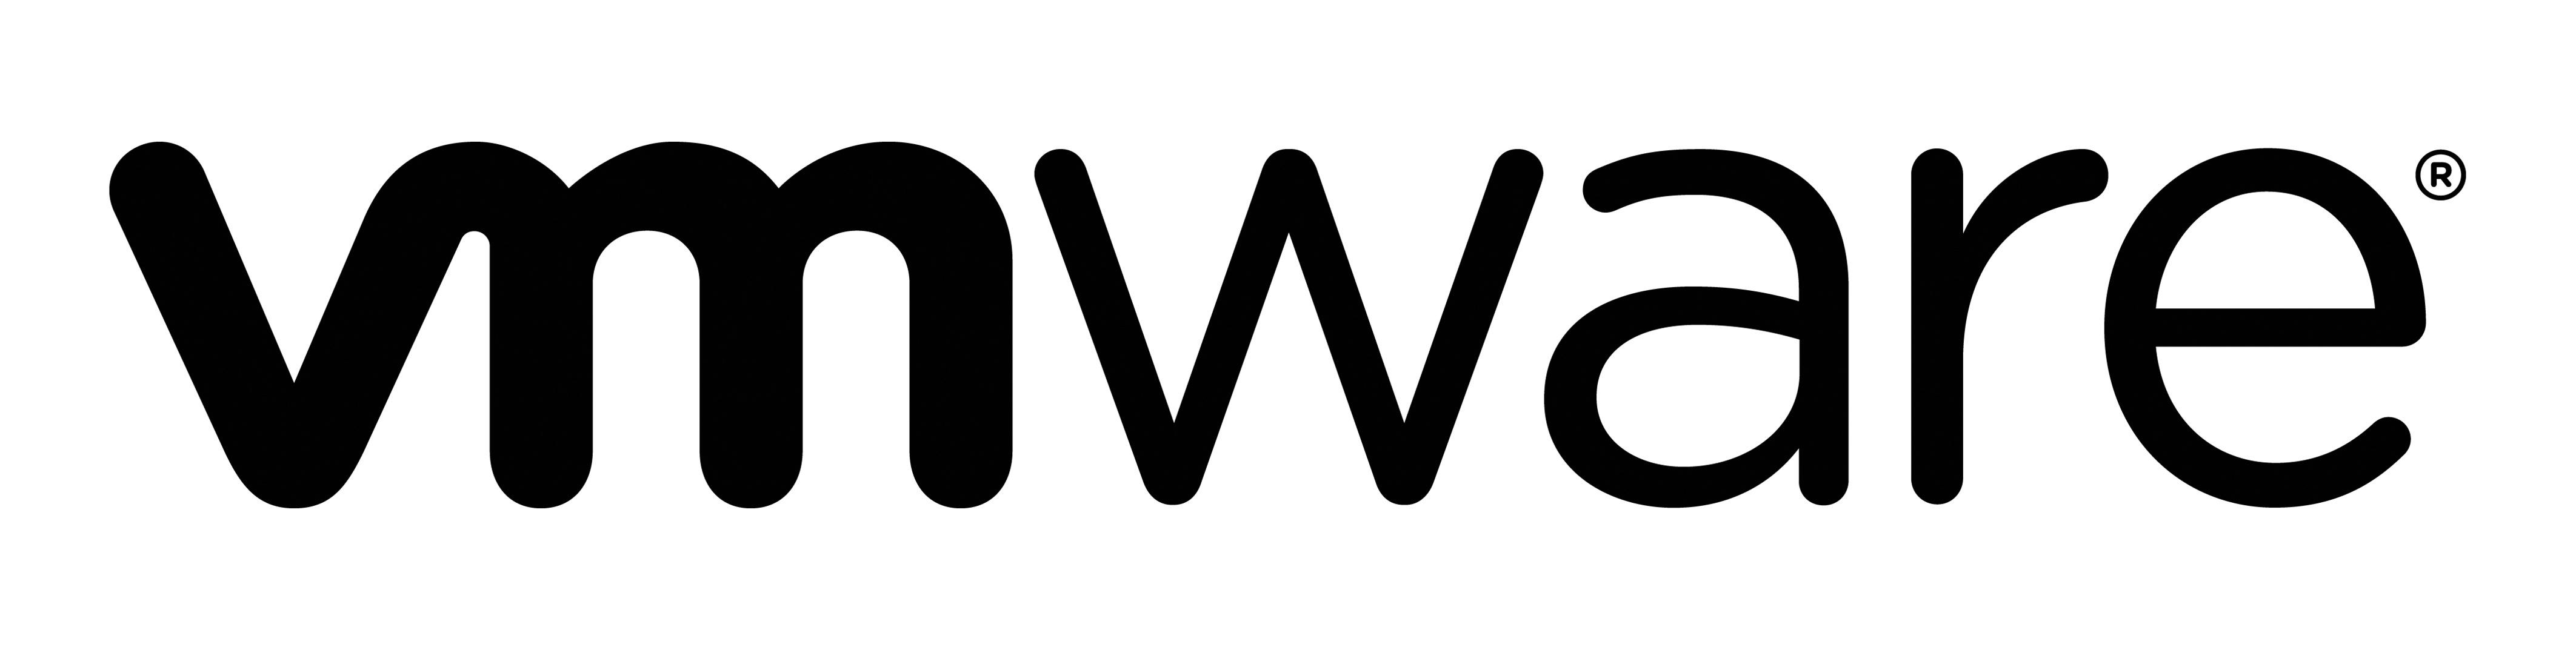 VMware coupon codes